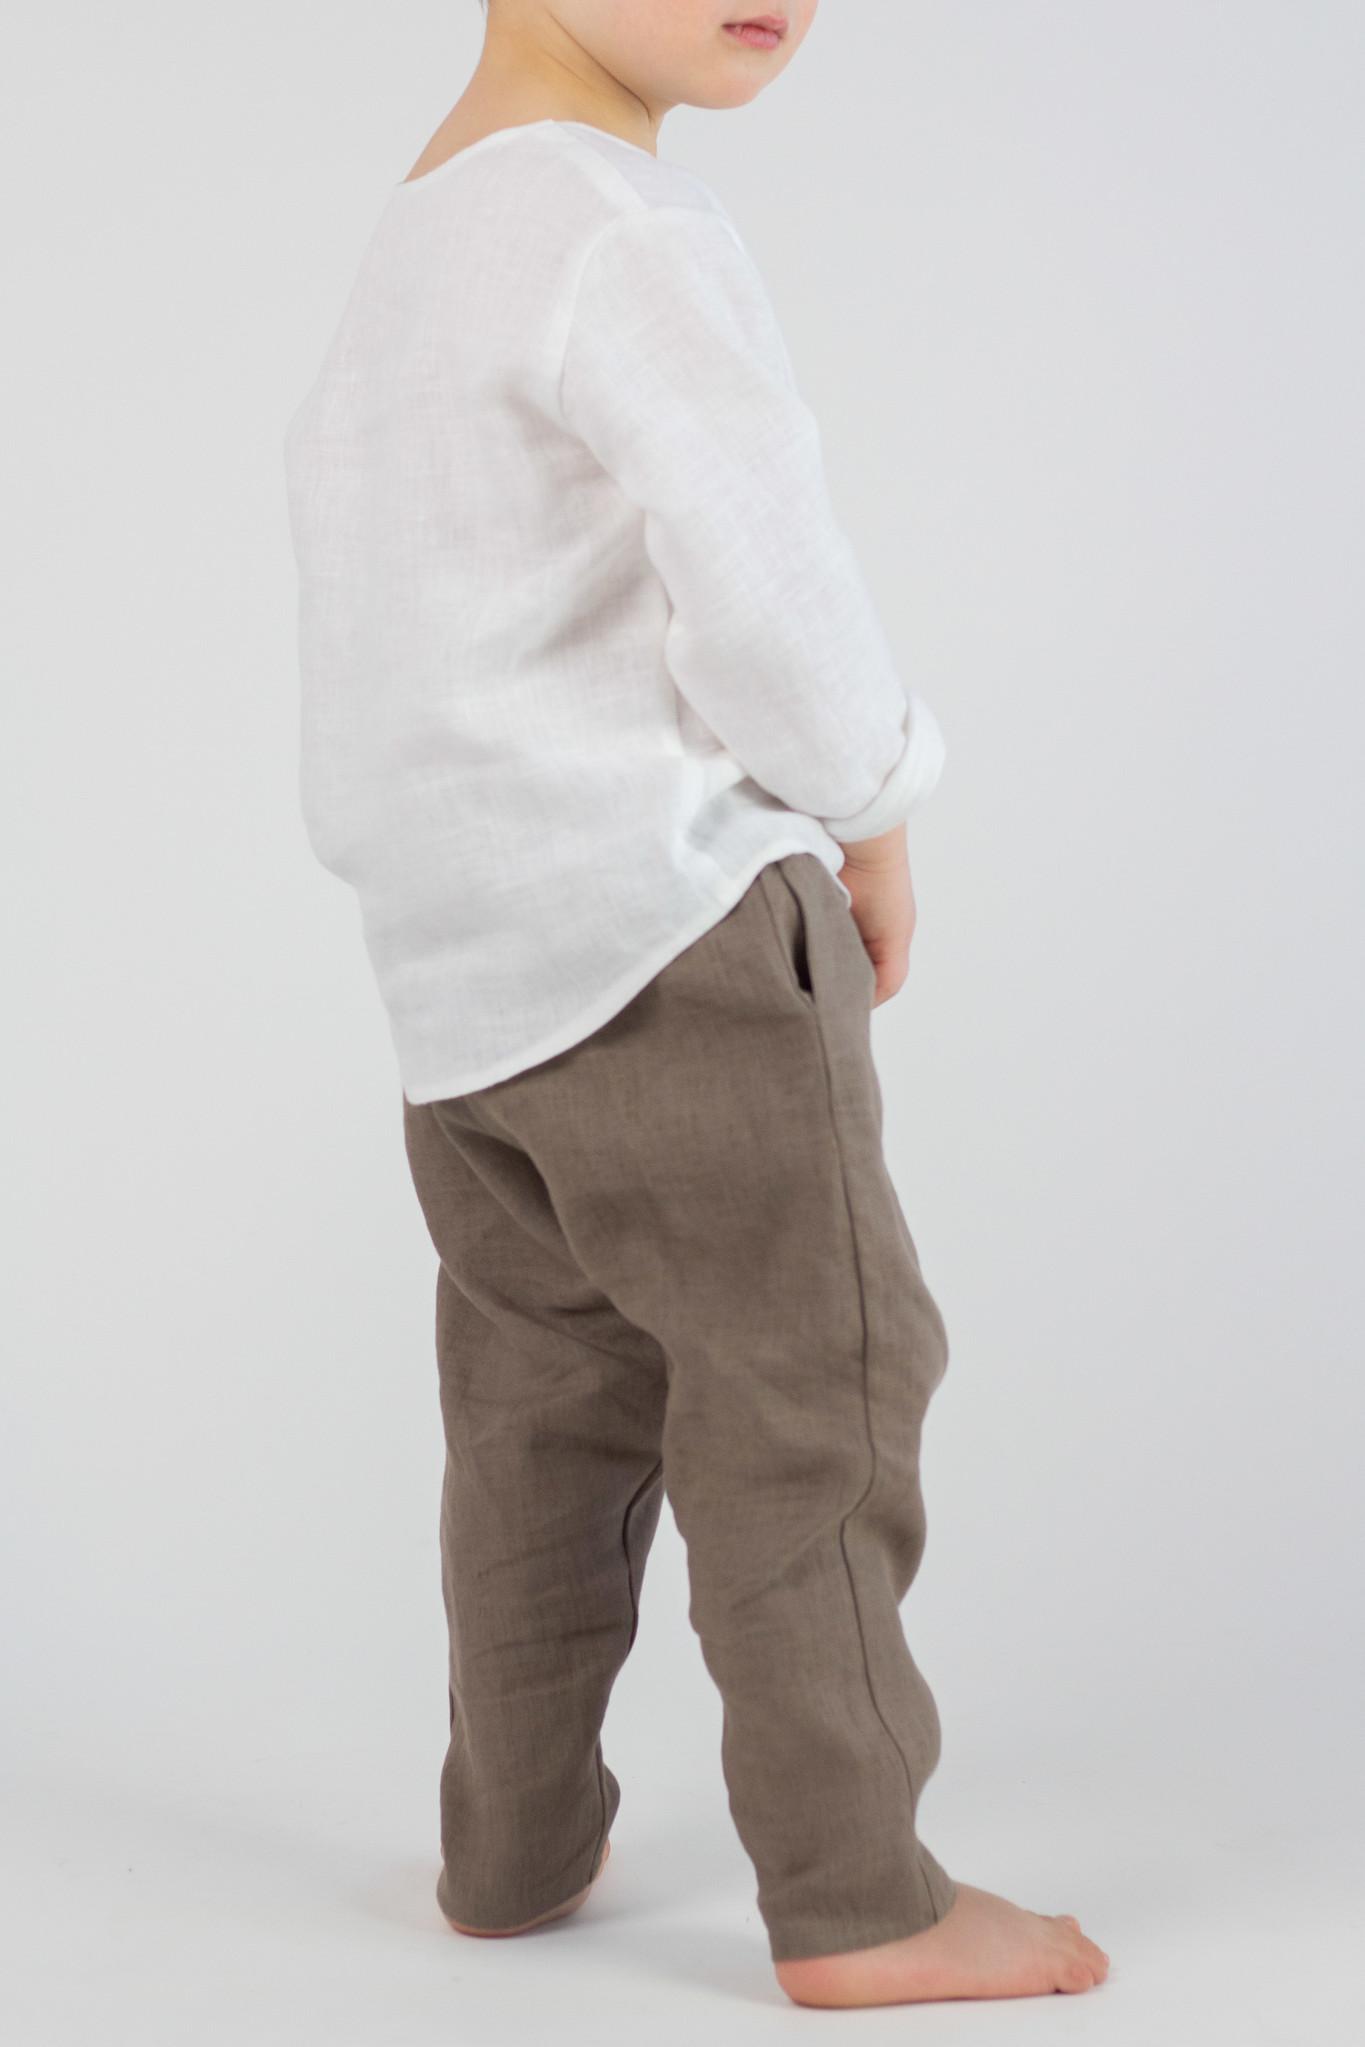 Kids linen shirt white-coloured